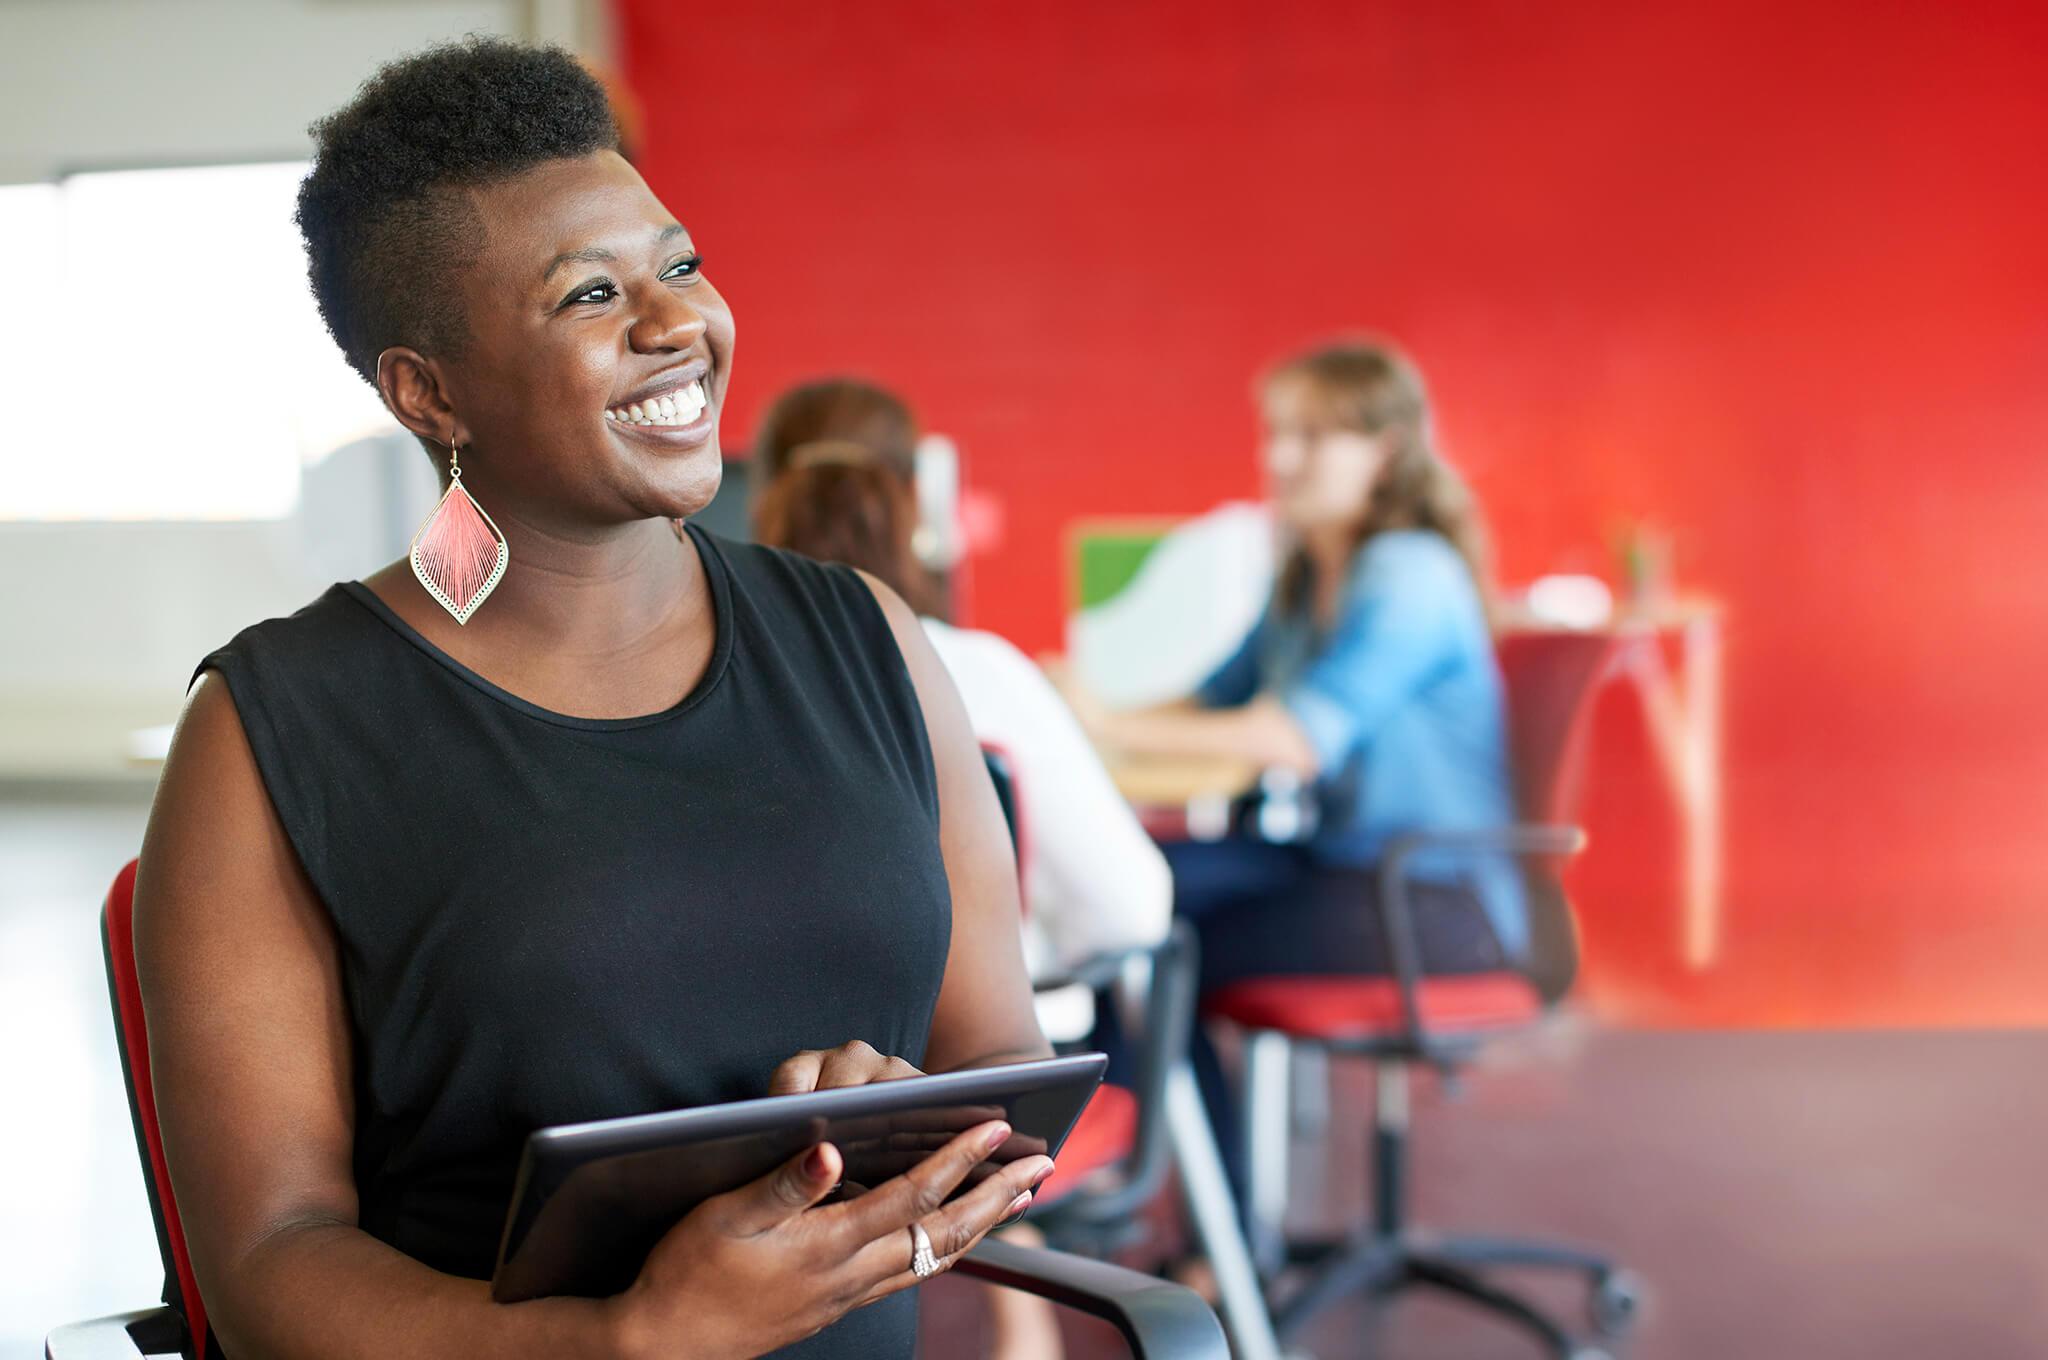 Employee advantage scheme – discounts from Vodafone